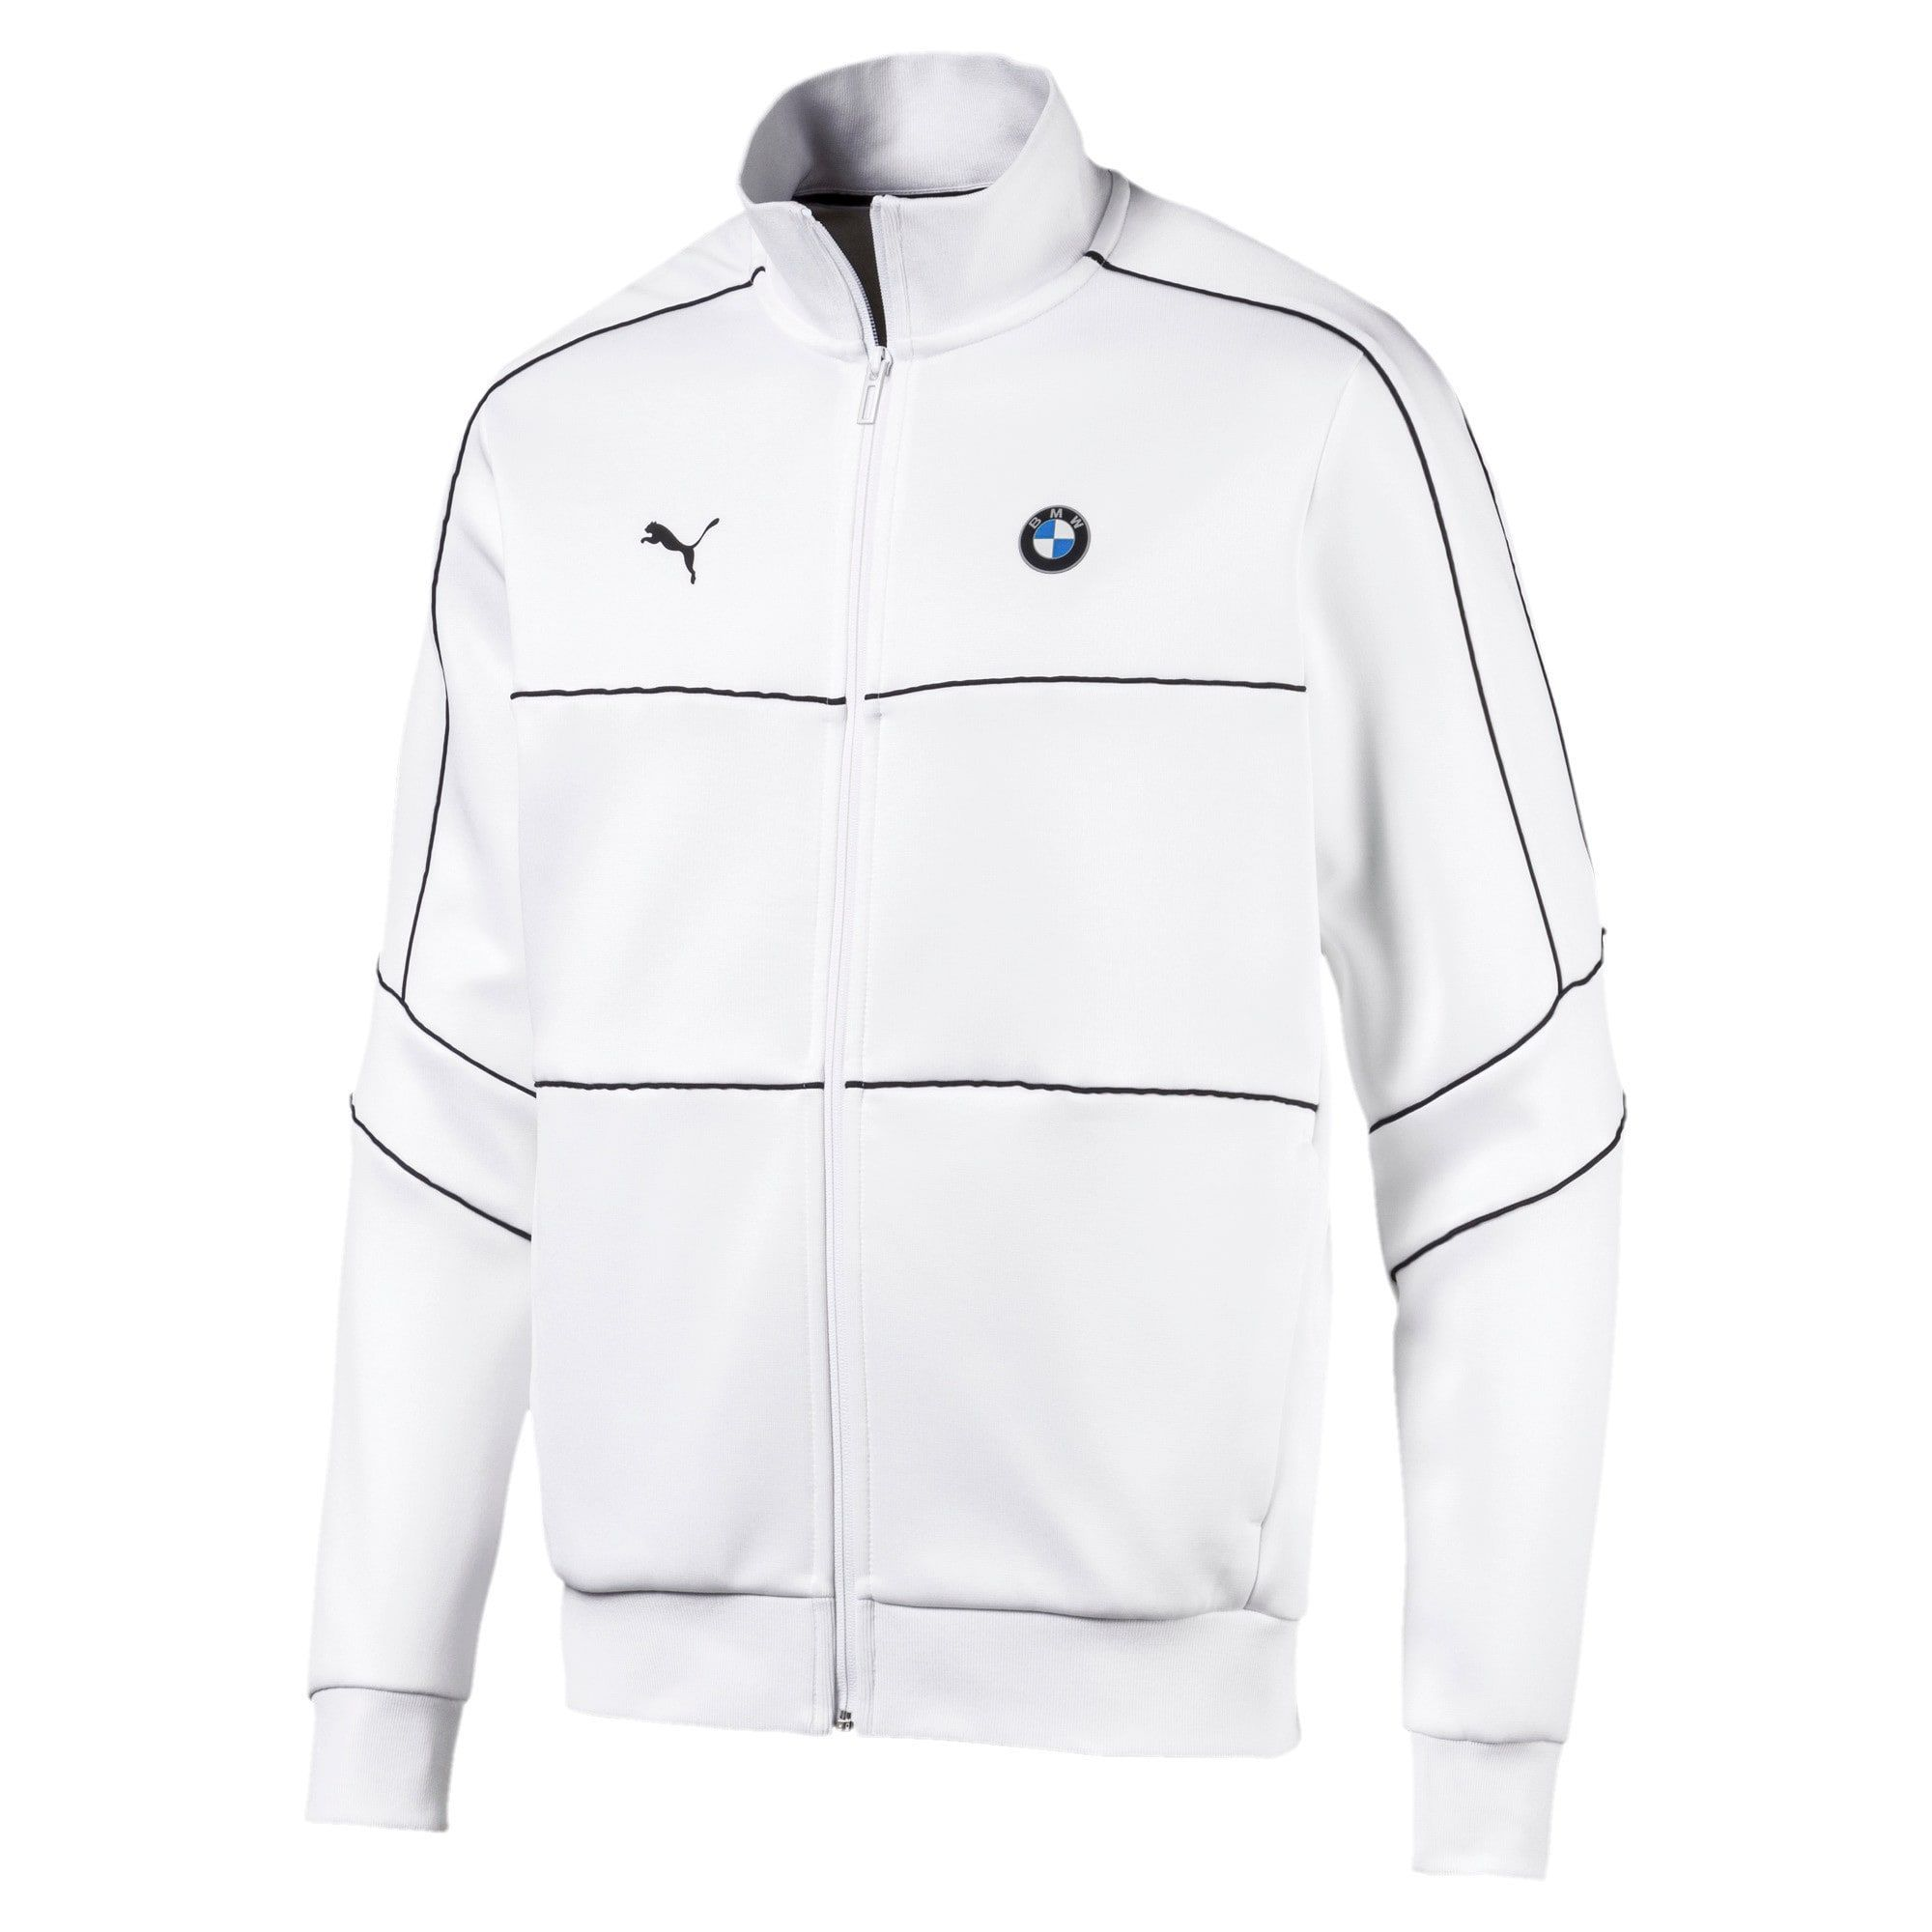 Épinglé sur Adidas Jacket